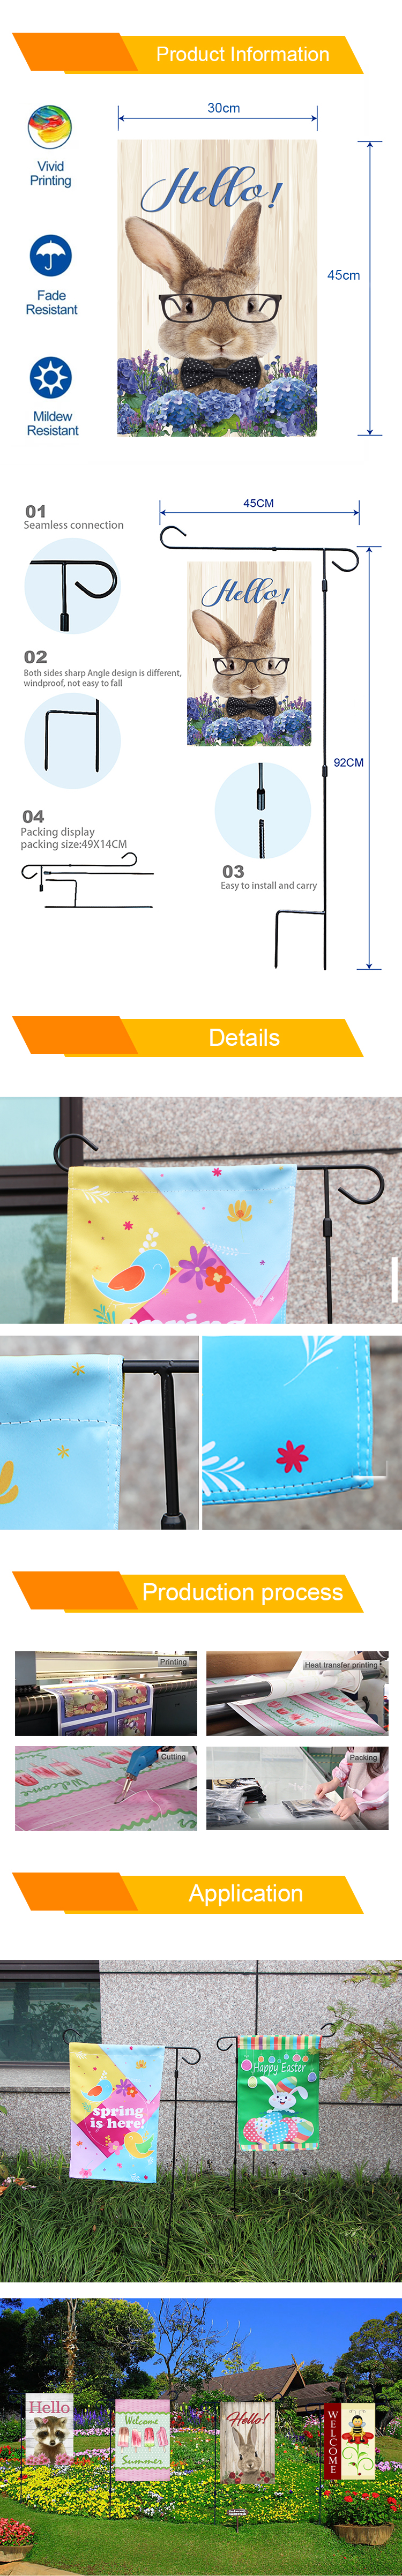 Custom Hot Sale Merry Christmas Garden Flag High Quality Heat Sublimation Printing Double Sides